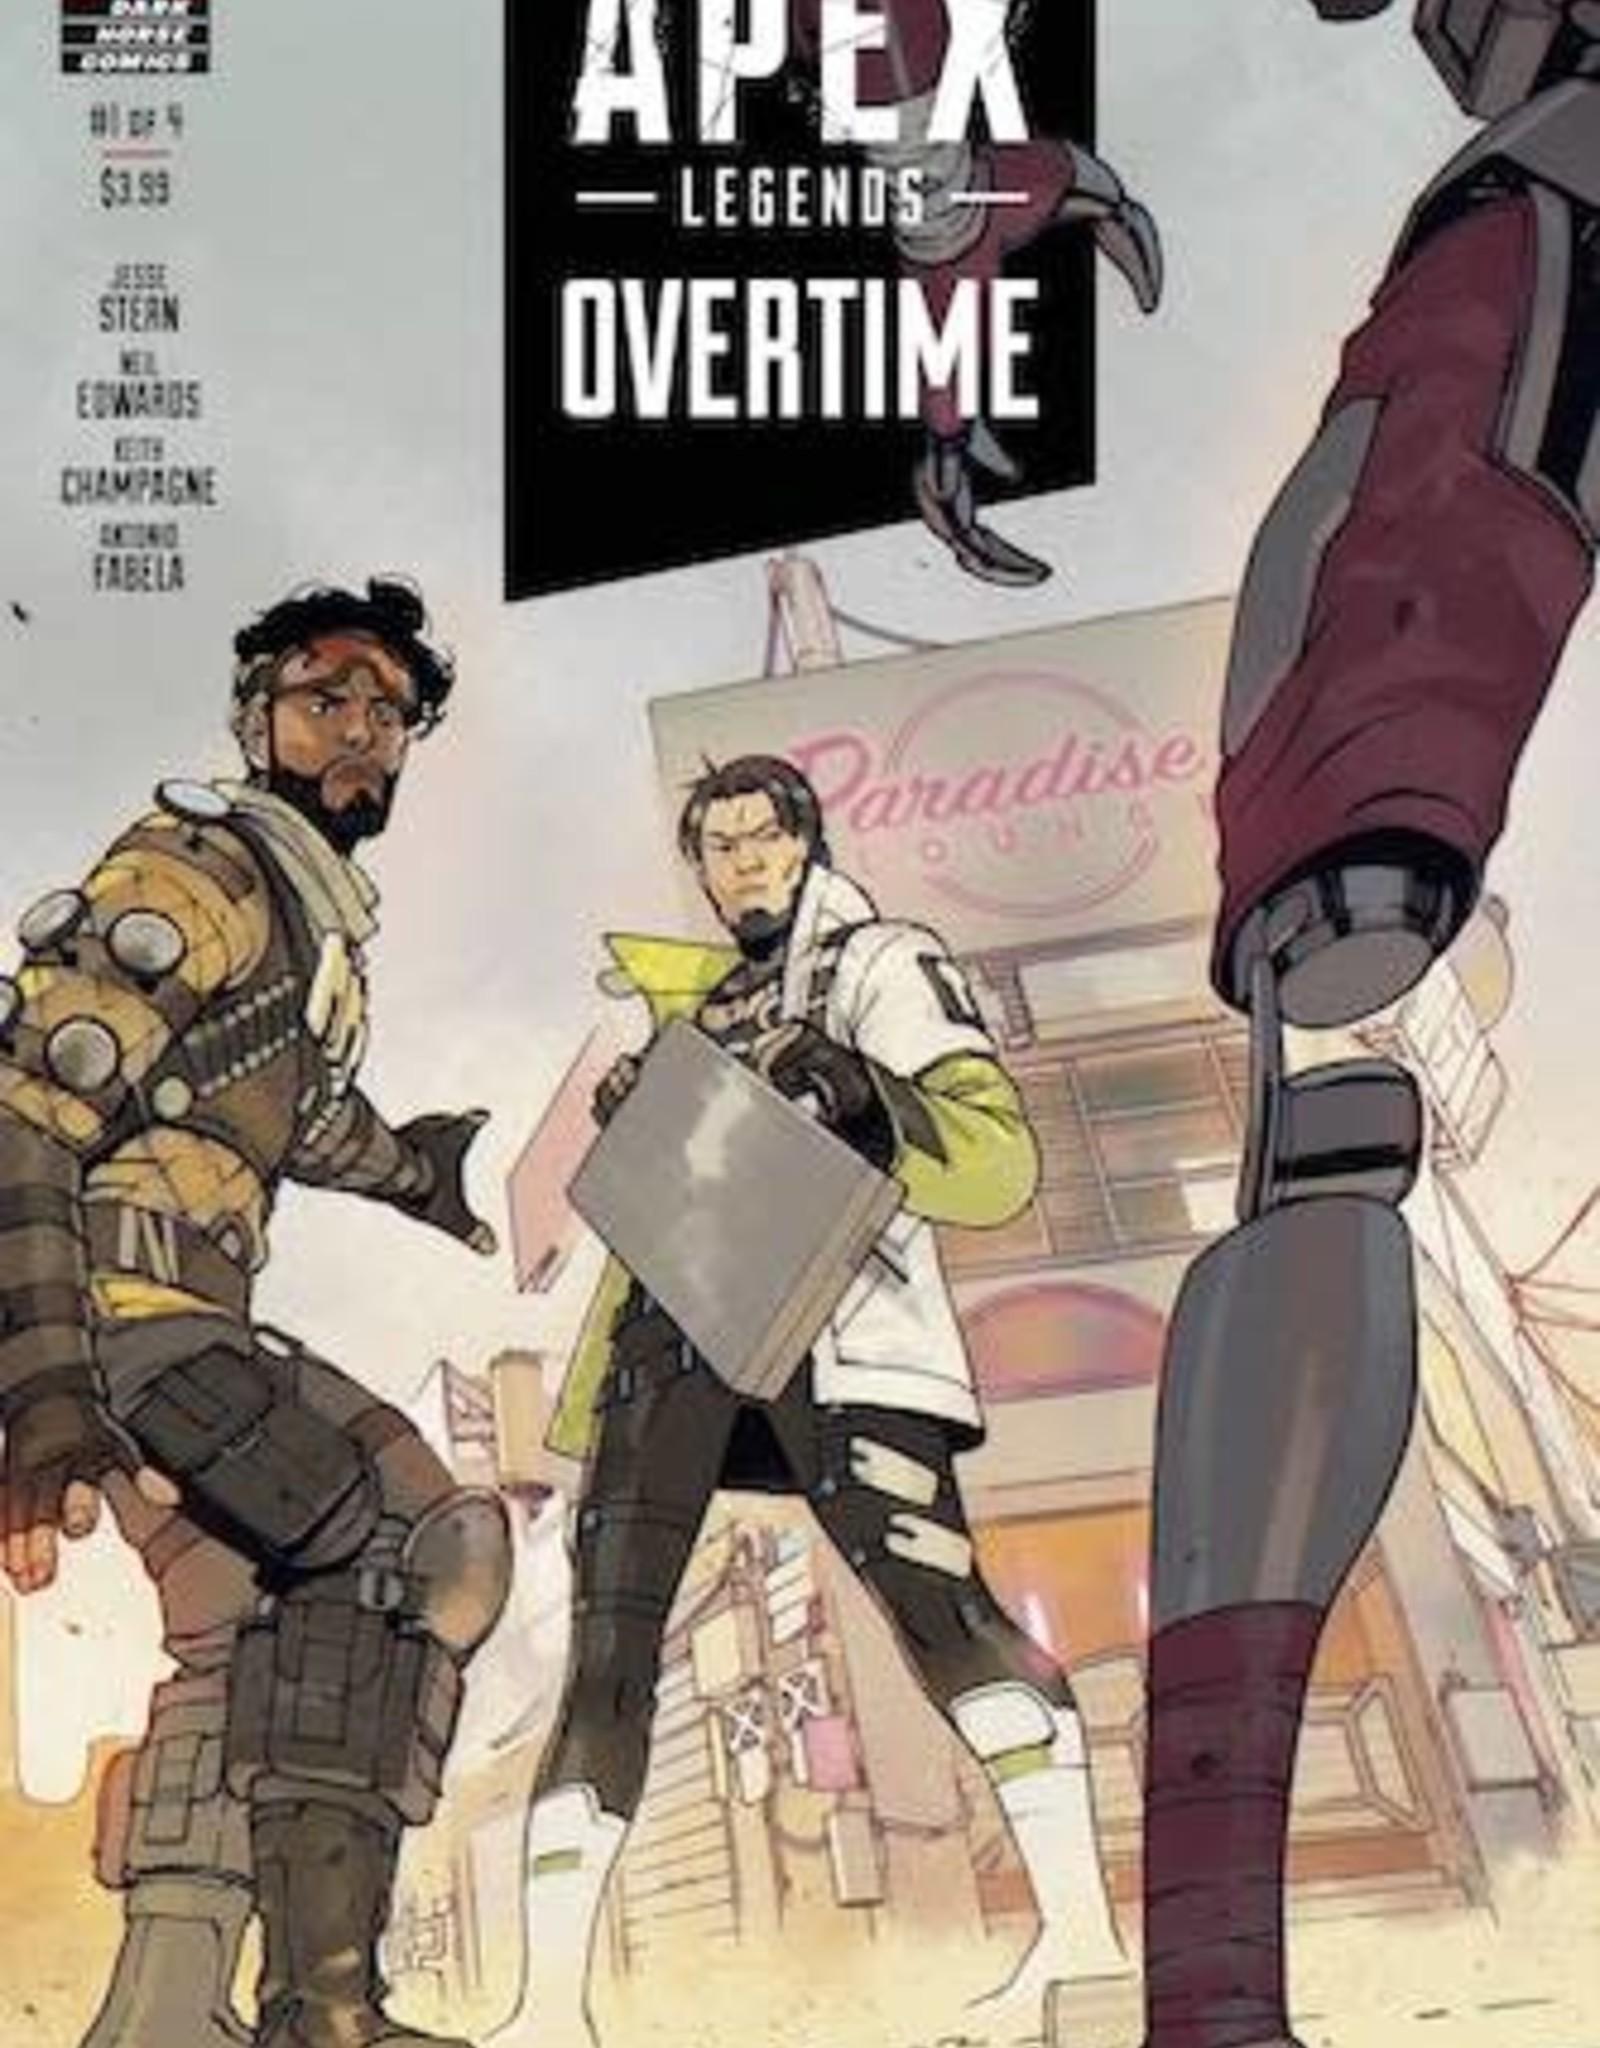 Dark Horse Comics Apex Legends Overtime #1